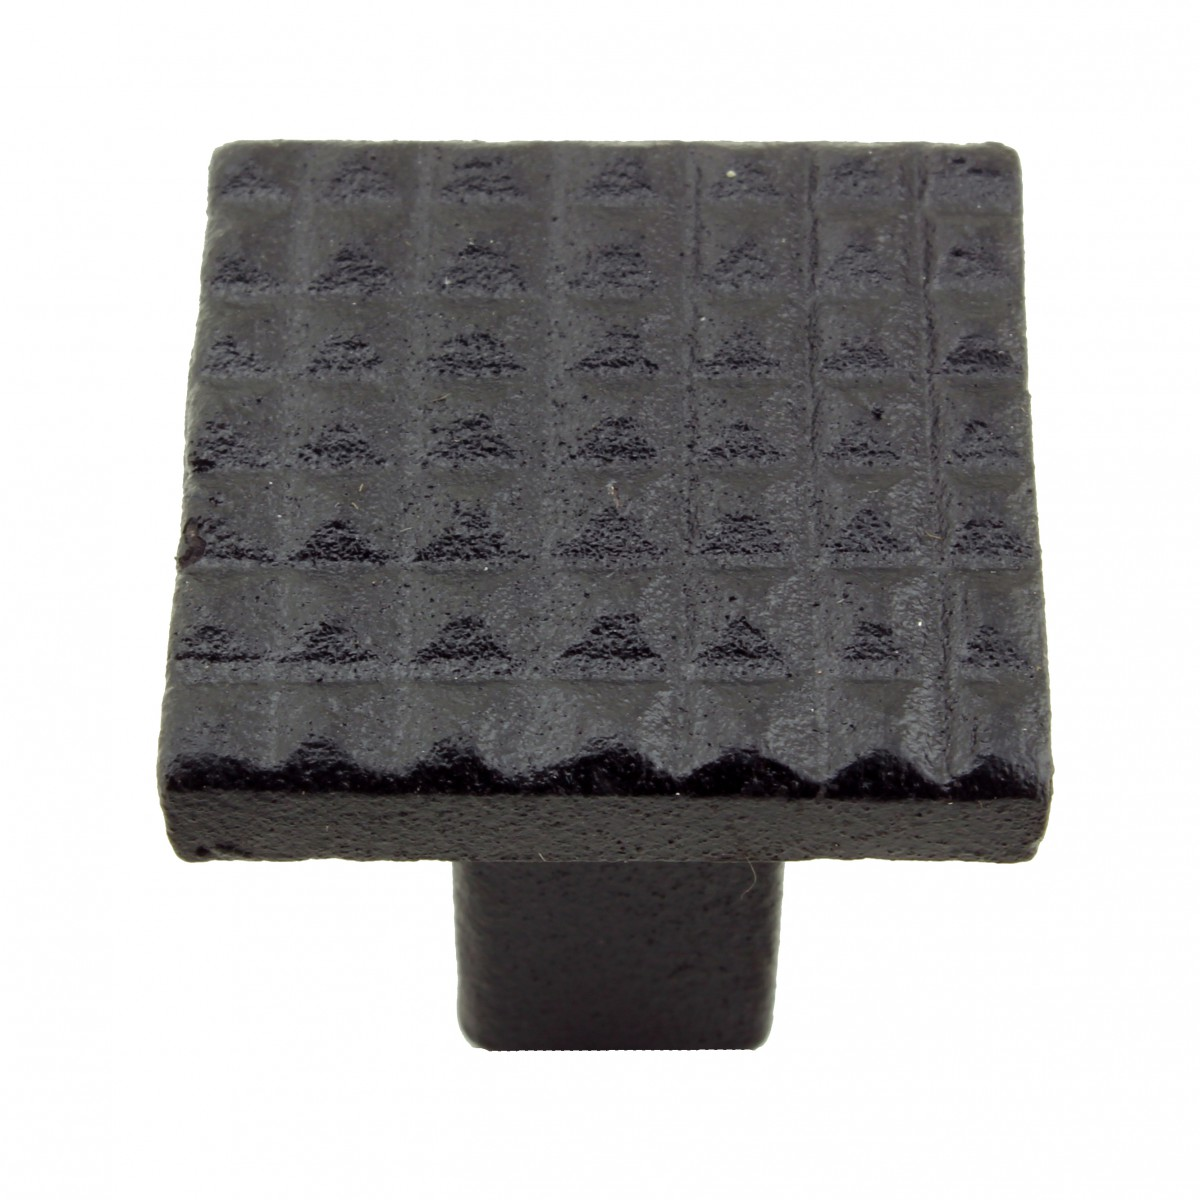 Square Grid Iron Cabinet Knob Black Pack of 2 Cabinet Knob Iron Cabinet Knob Cabinet Knob Black